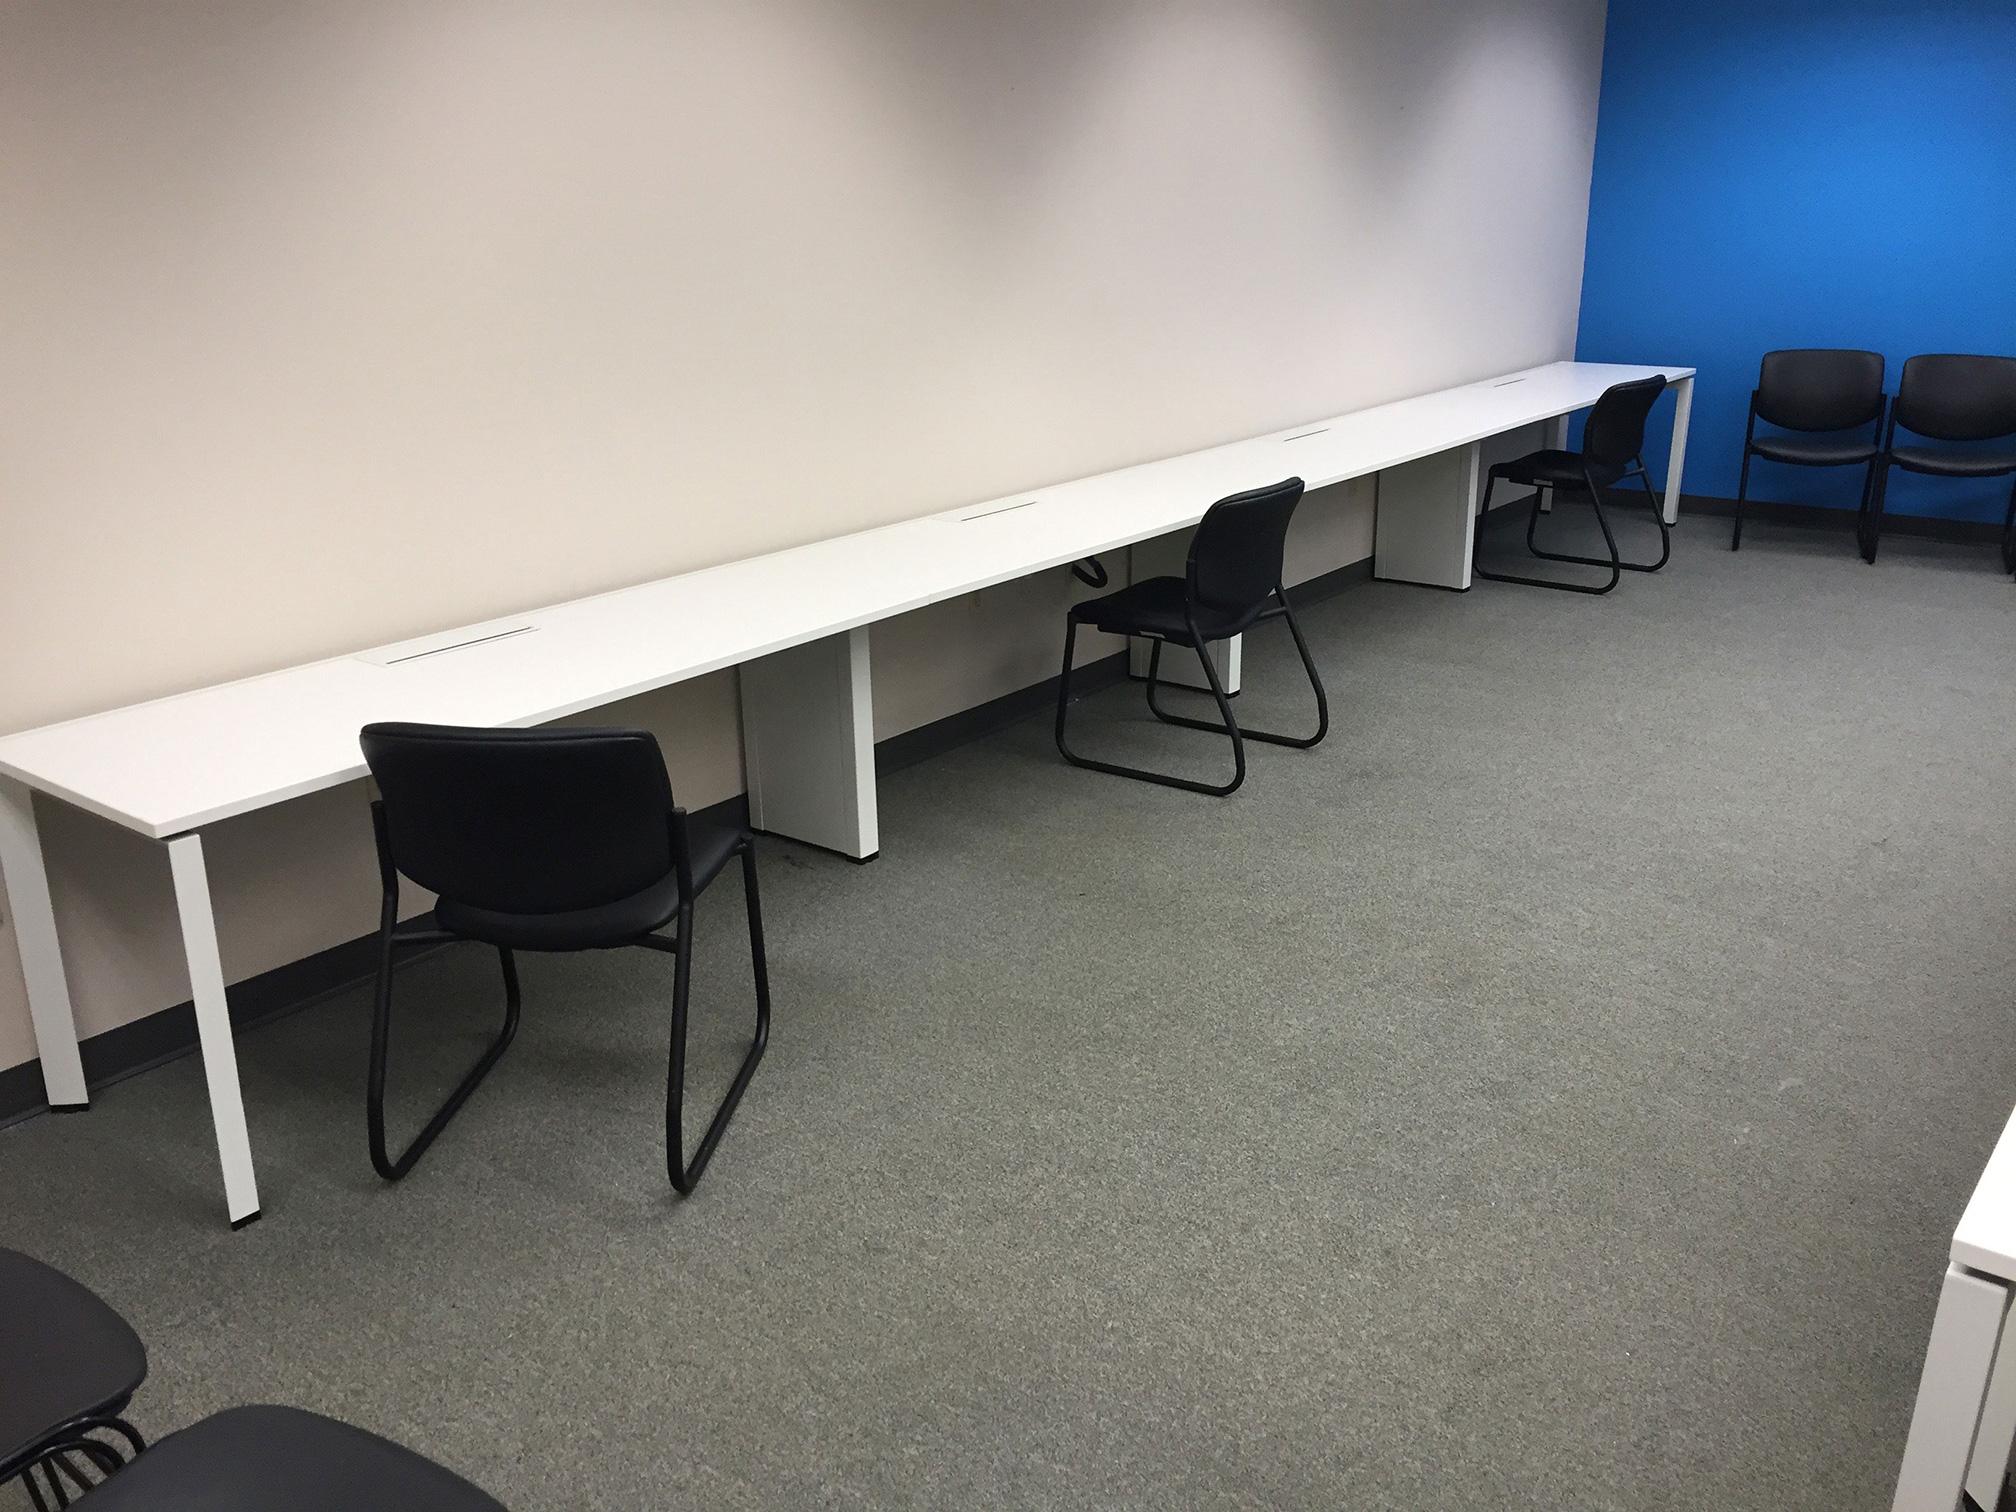 furniture-cubicles-in-fort-lauderdale-florida-6.jpg